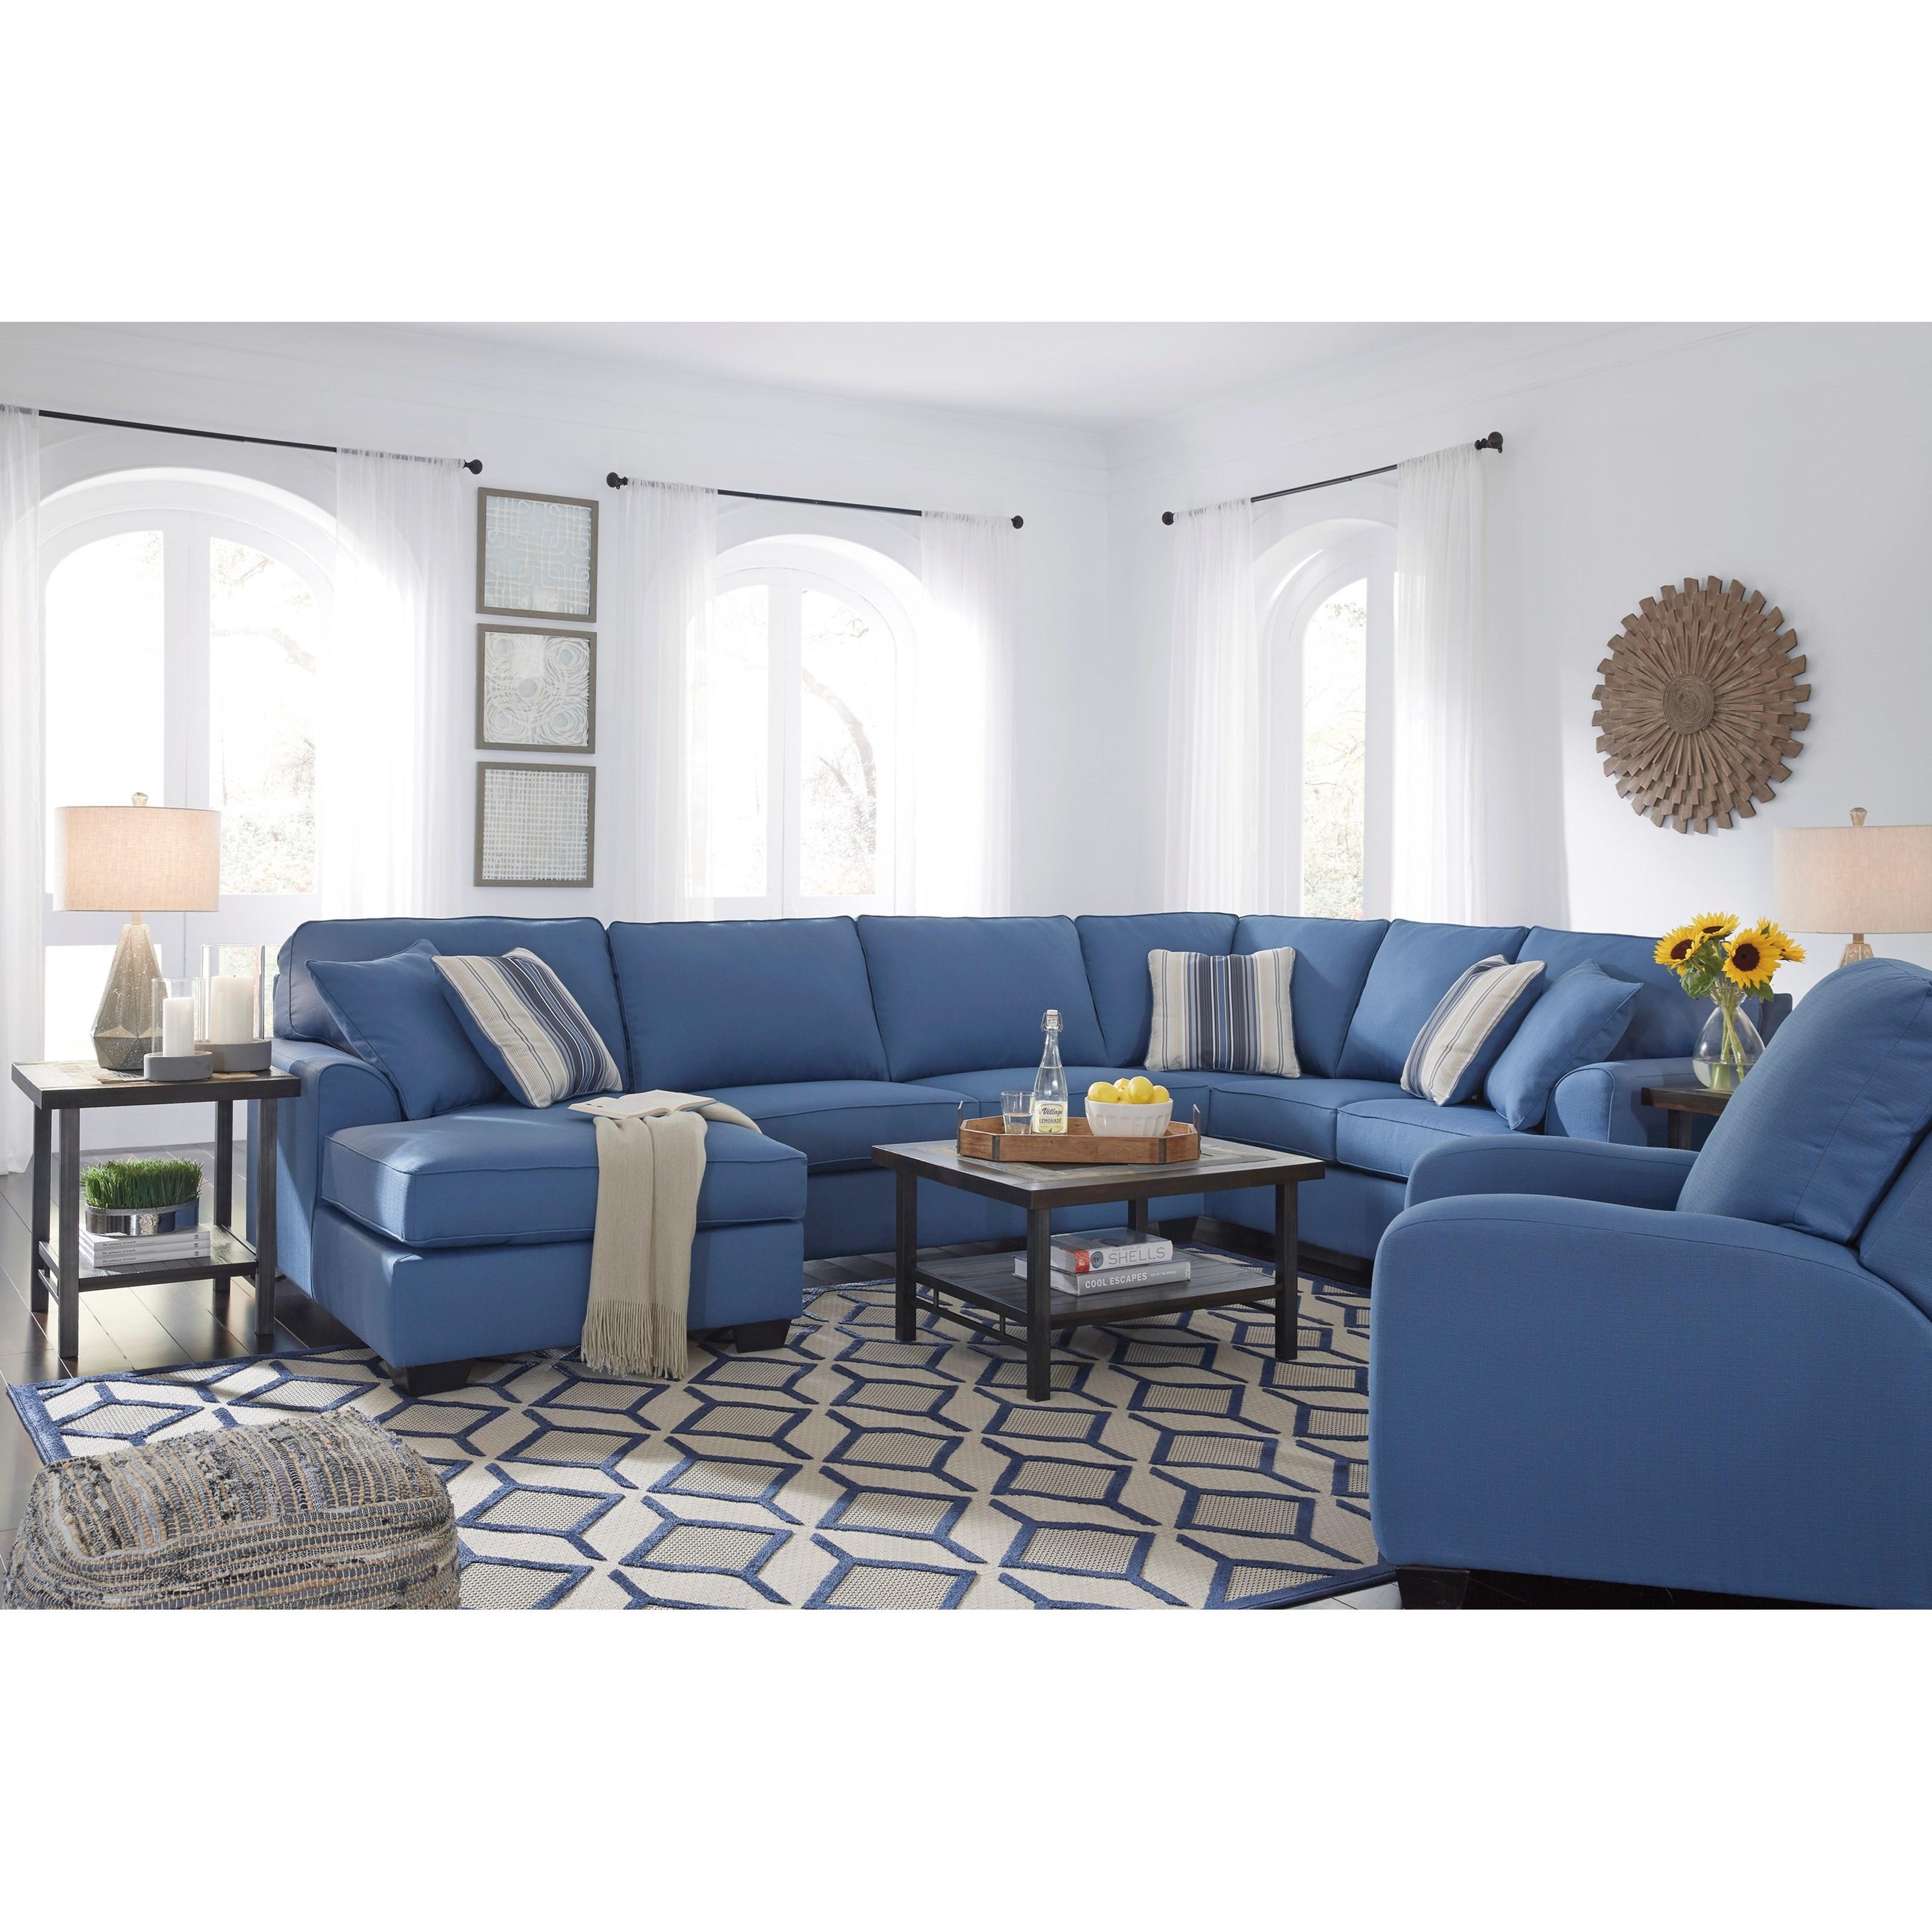 Benchcraft Brioni Nuvella Stationary Living Room Group - Item Number: 62303 Living Room Group 10